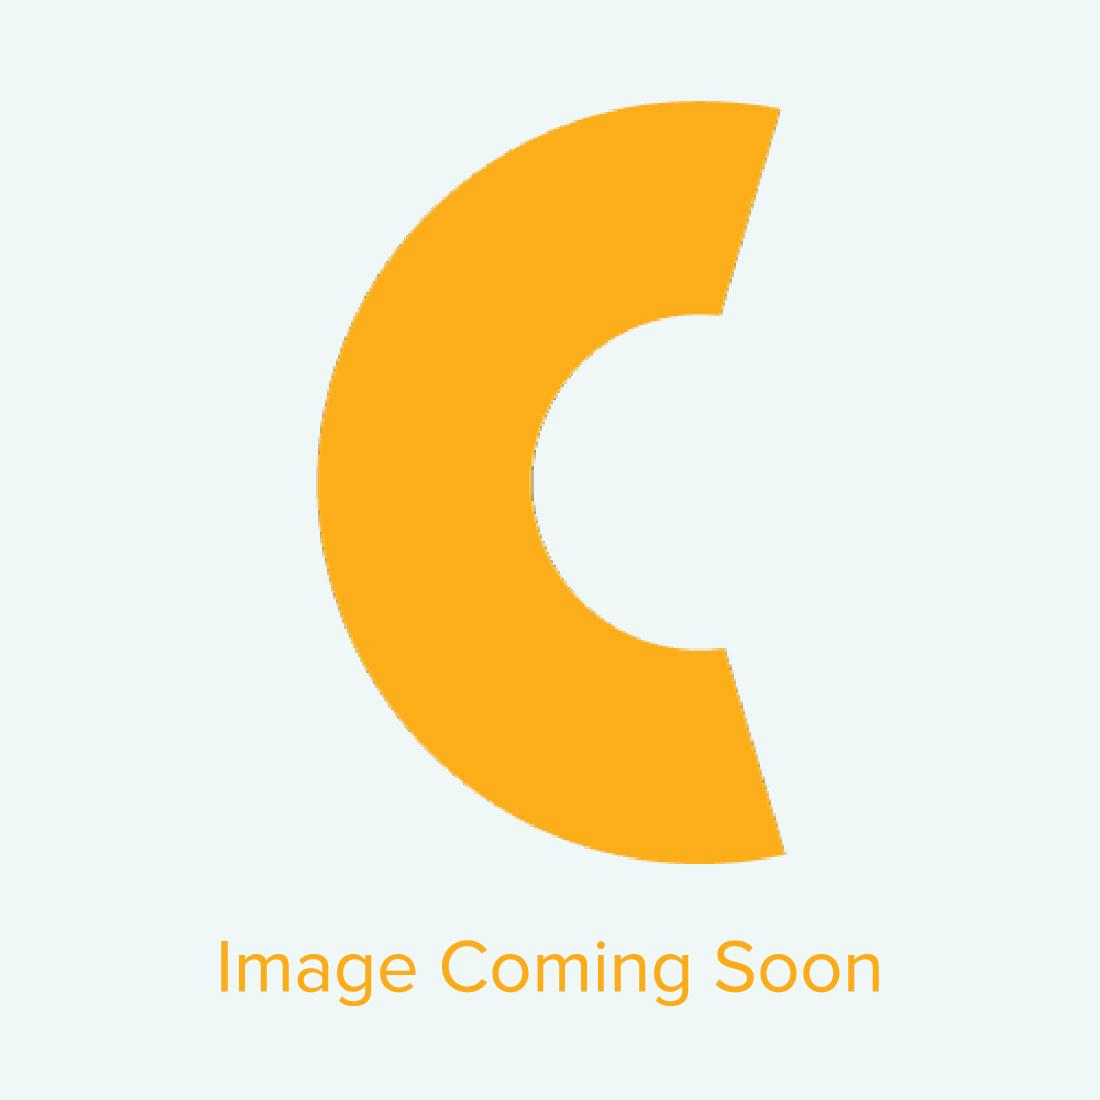 "Premier Ceramic Sublimation Tile - Glossy White - 6"" x 8"" - 28/case"